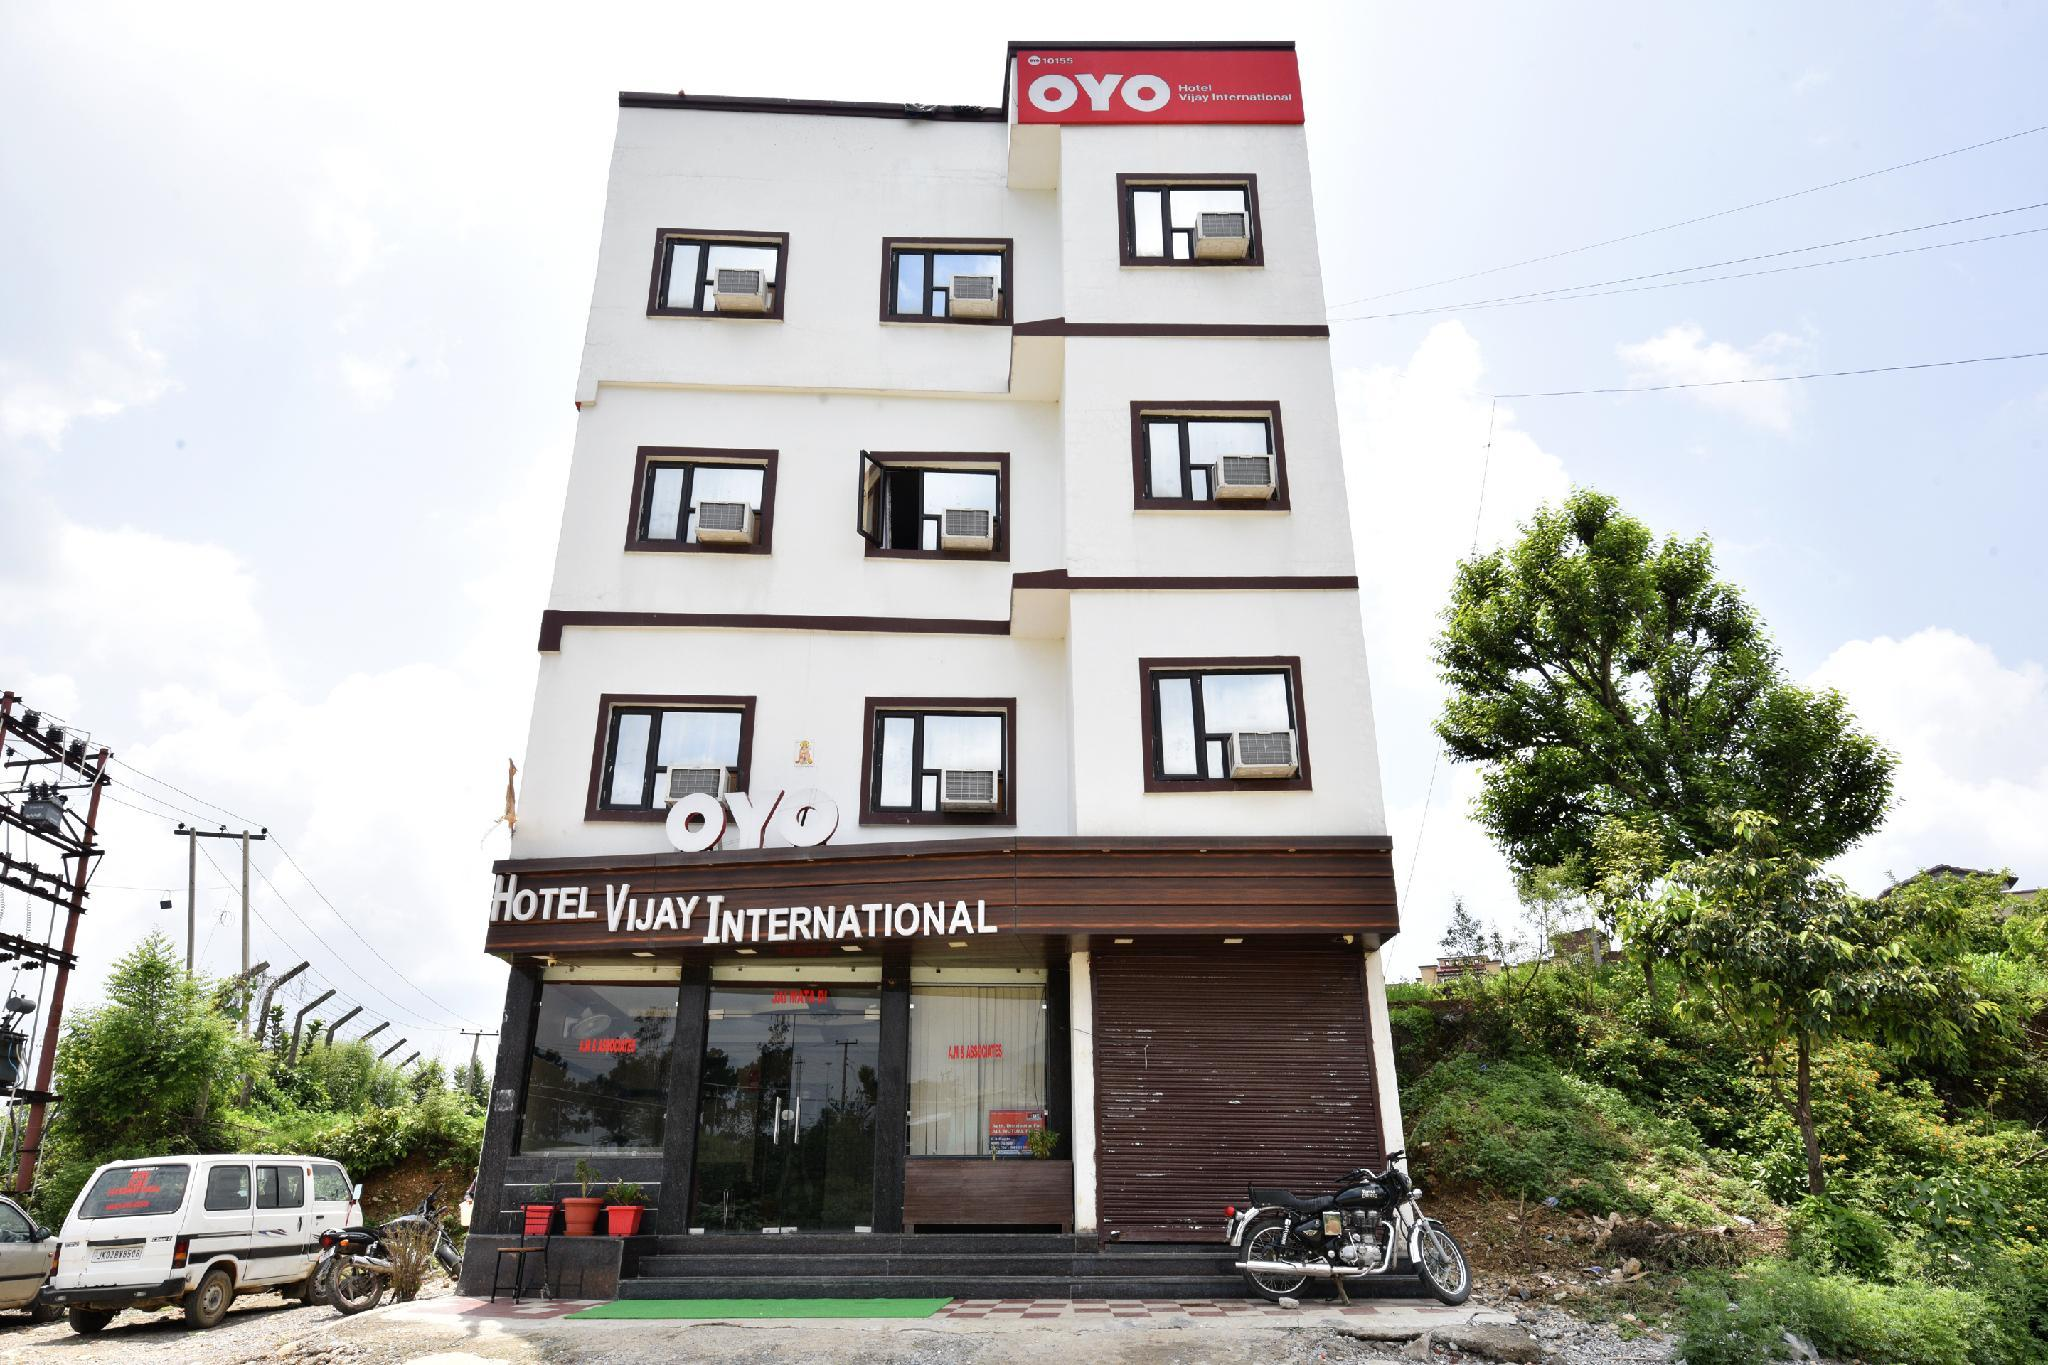 OYO 10155 Vijay International